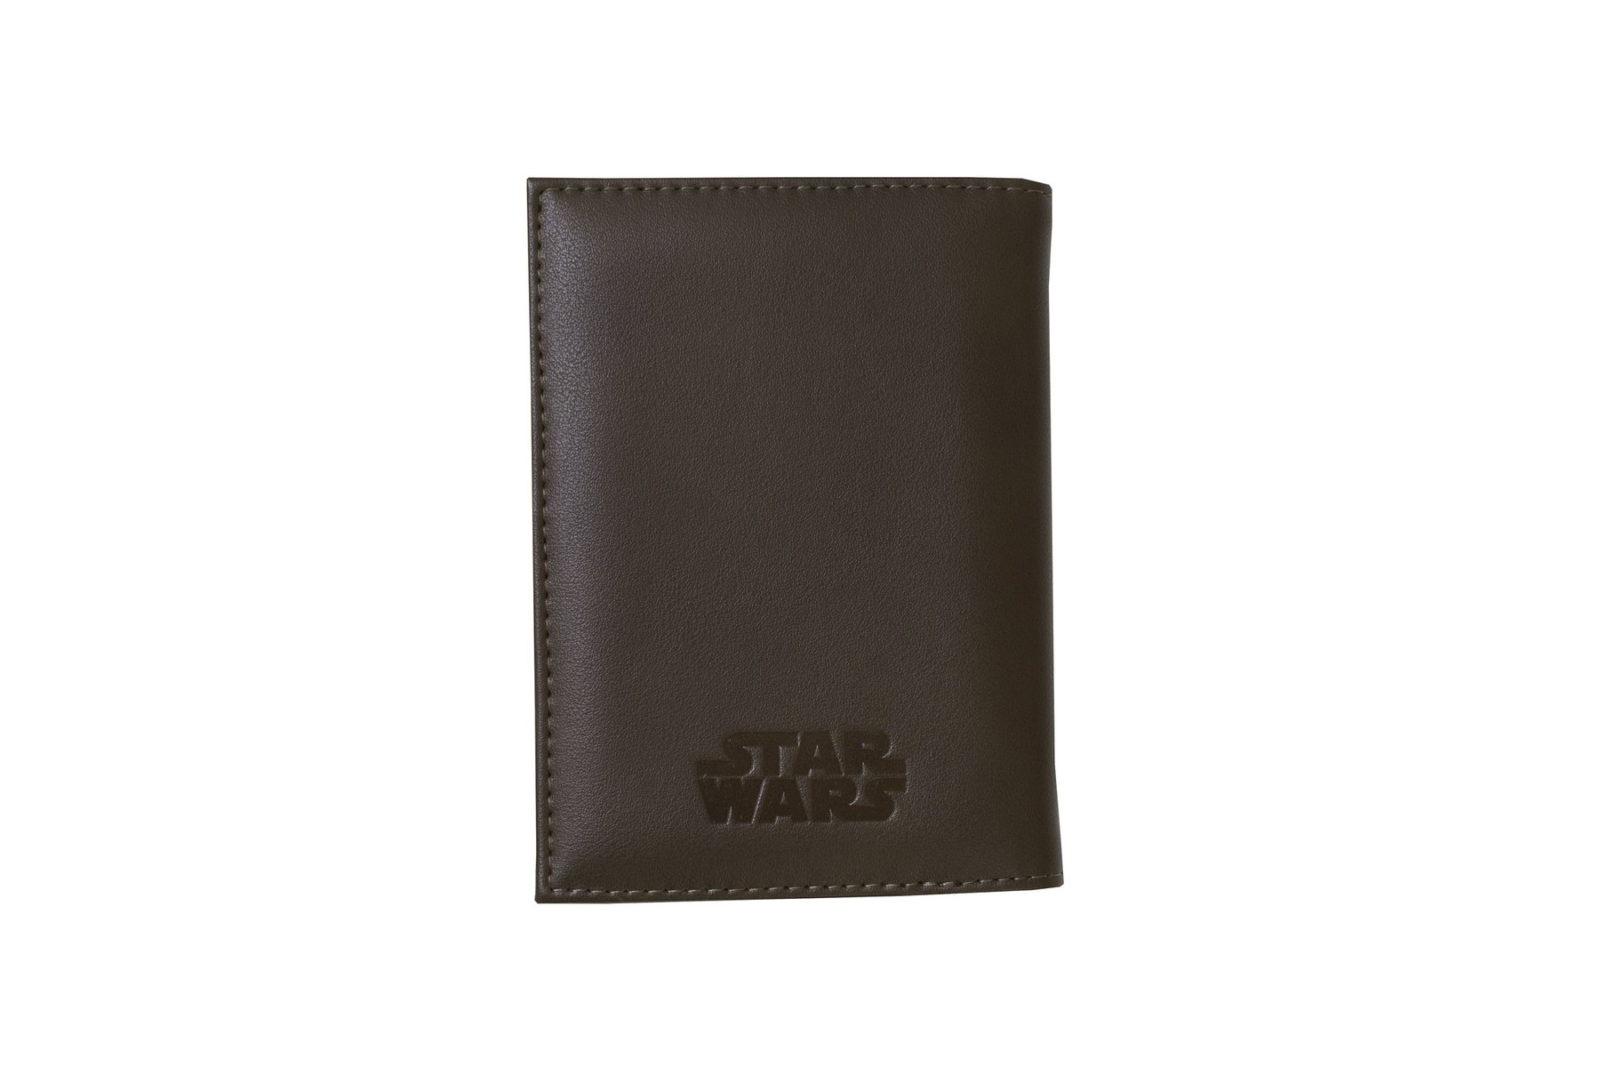 Cakeworthy x Star Wars Tatooine Passport Holder